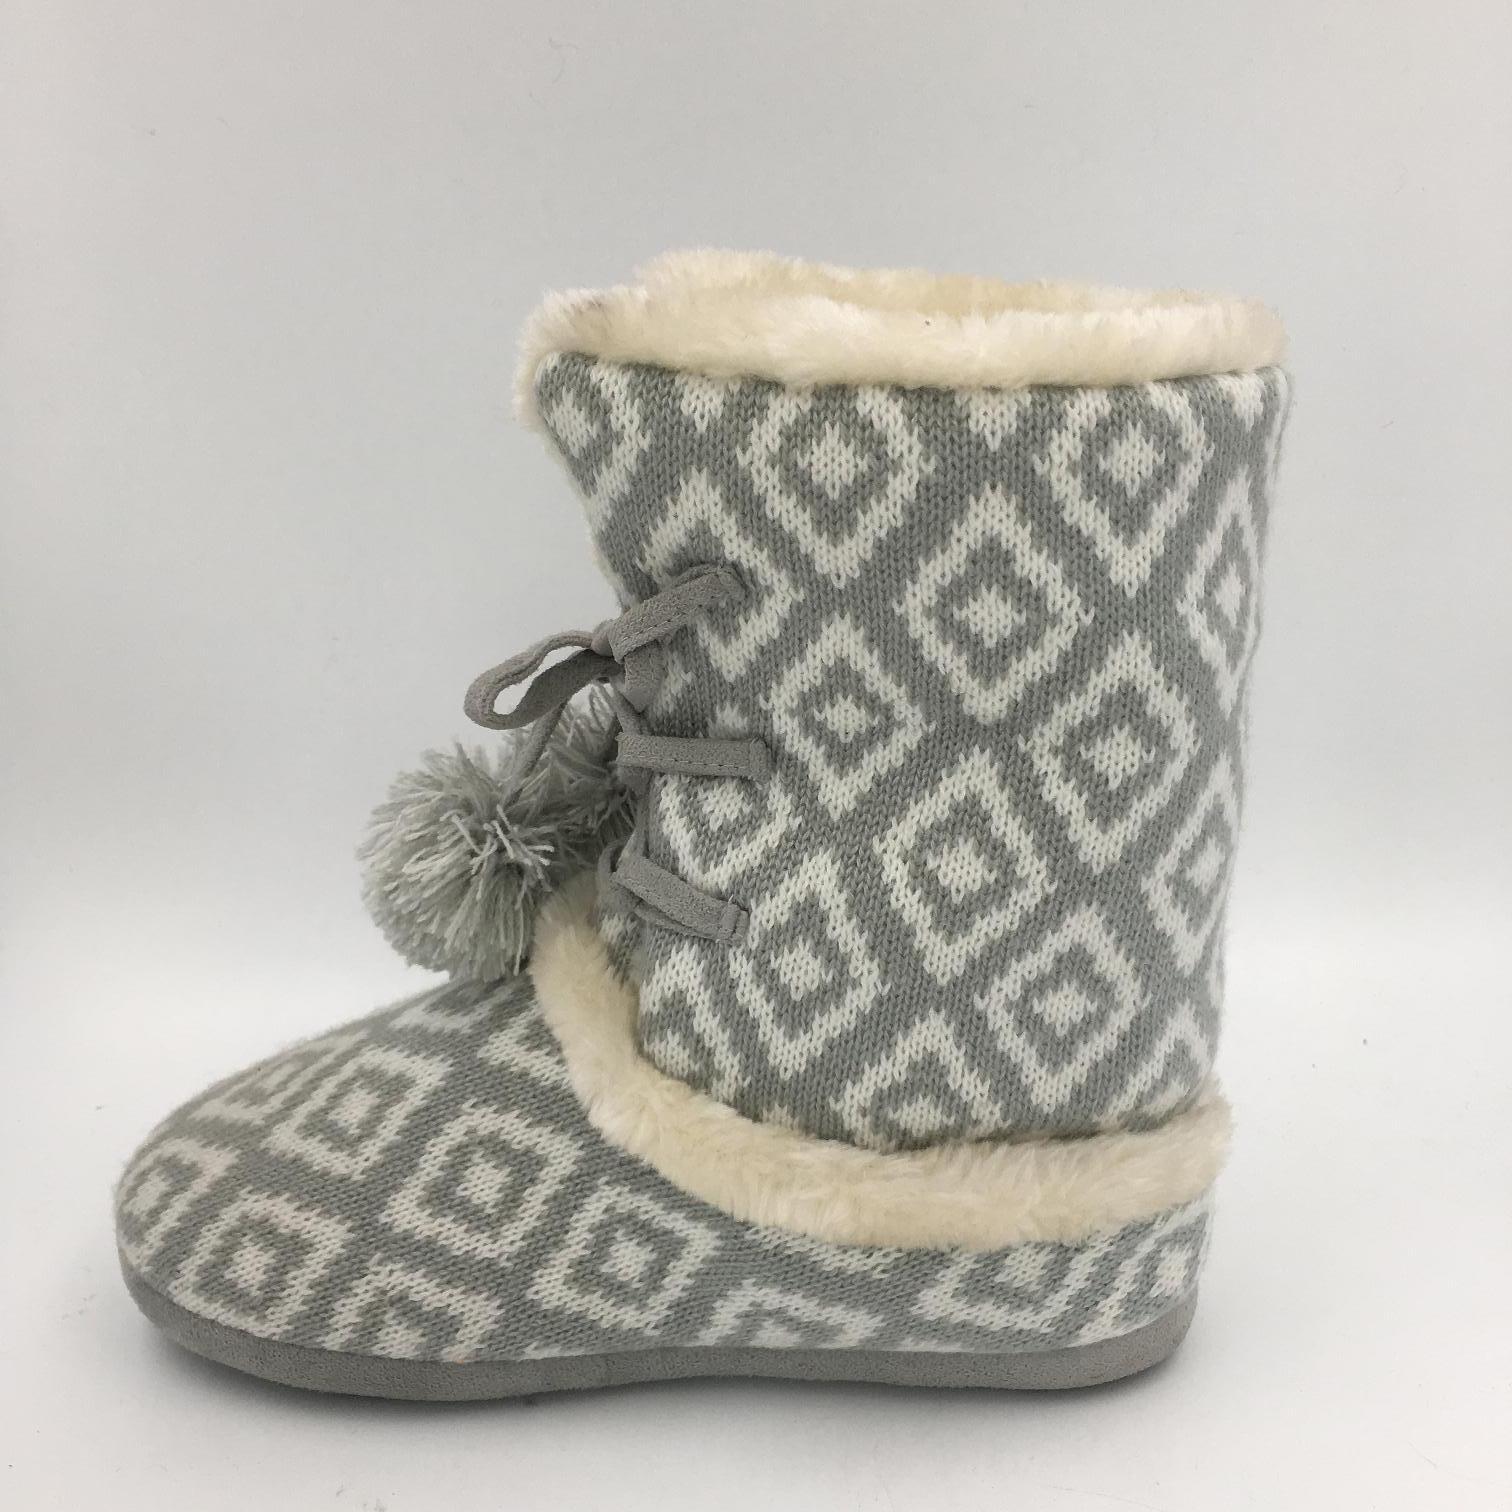 Lds Multi Knit Warm Indoor Slipper